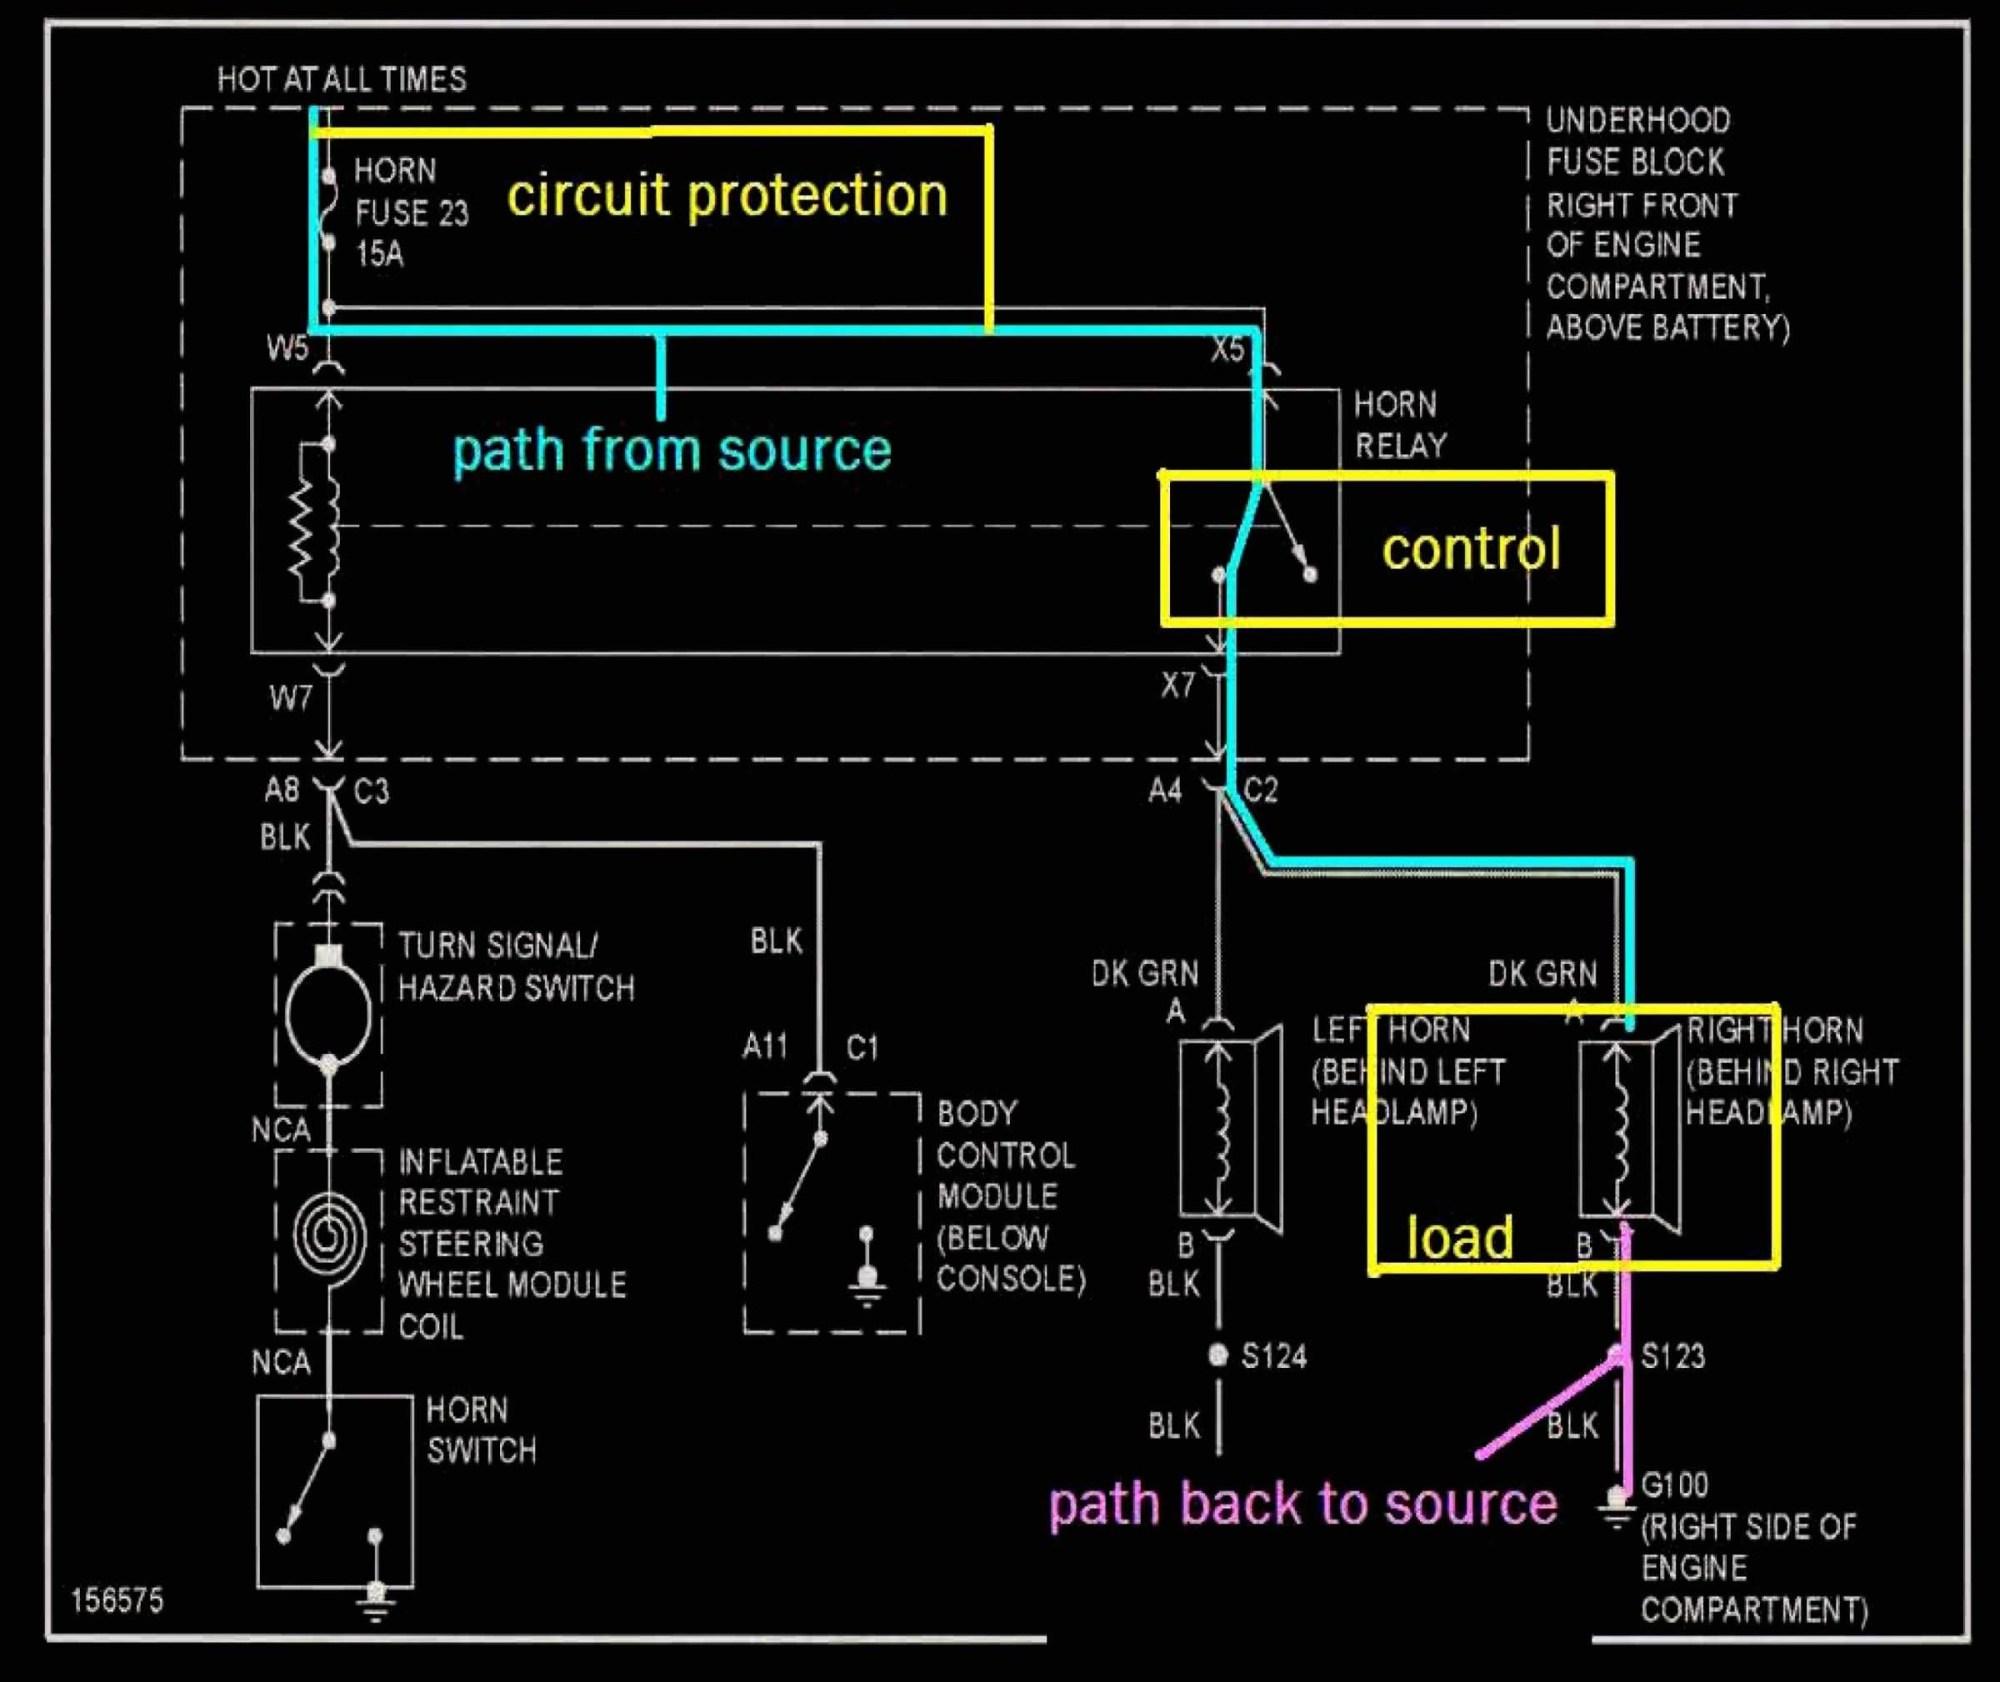 hight resolution of toshiba wiring diagram herrmidifier on lochinvar wiring diagram